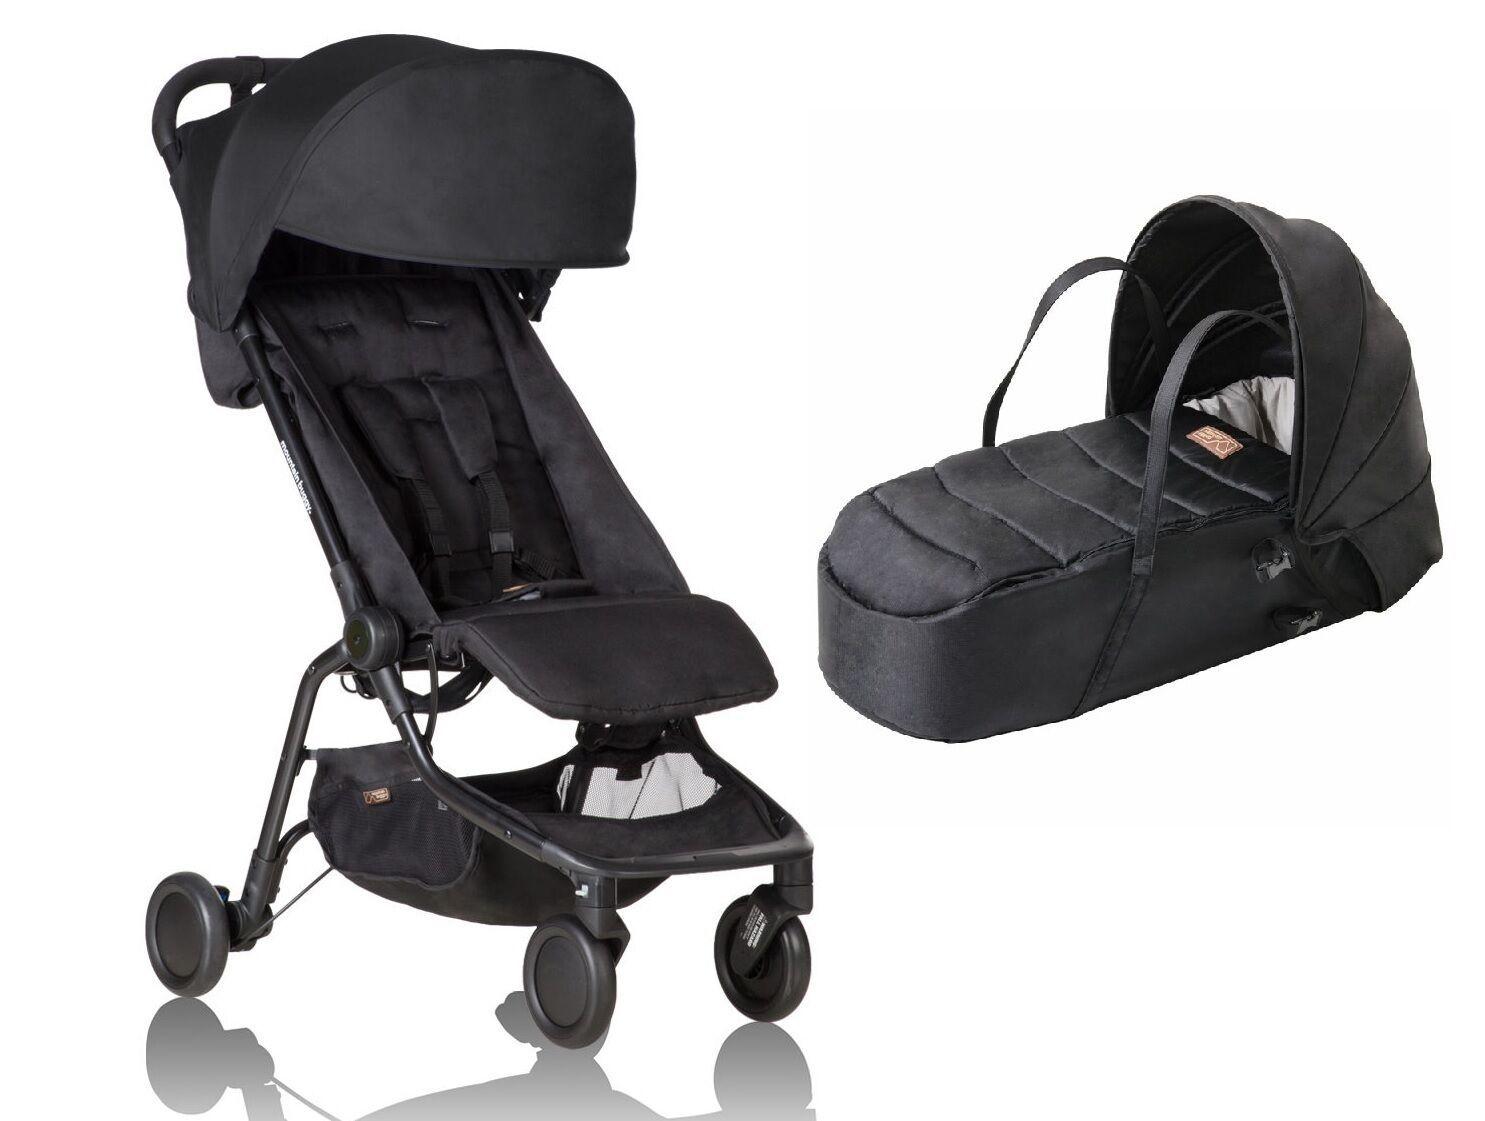 open box Mountain Buggy Nano Bundle Stroller /& Cocoon in Black NEW!